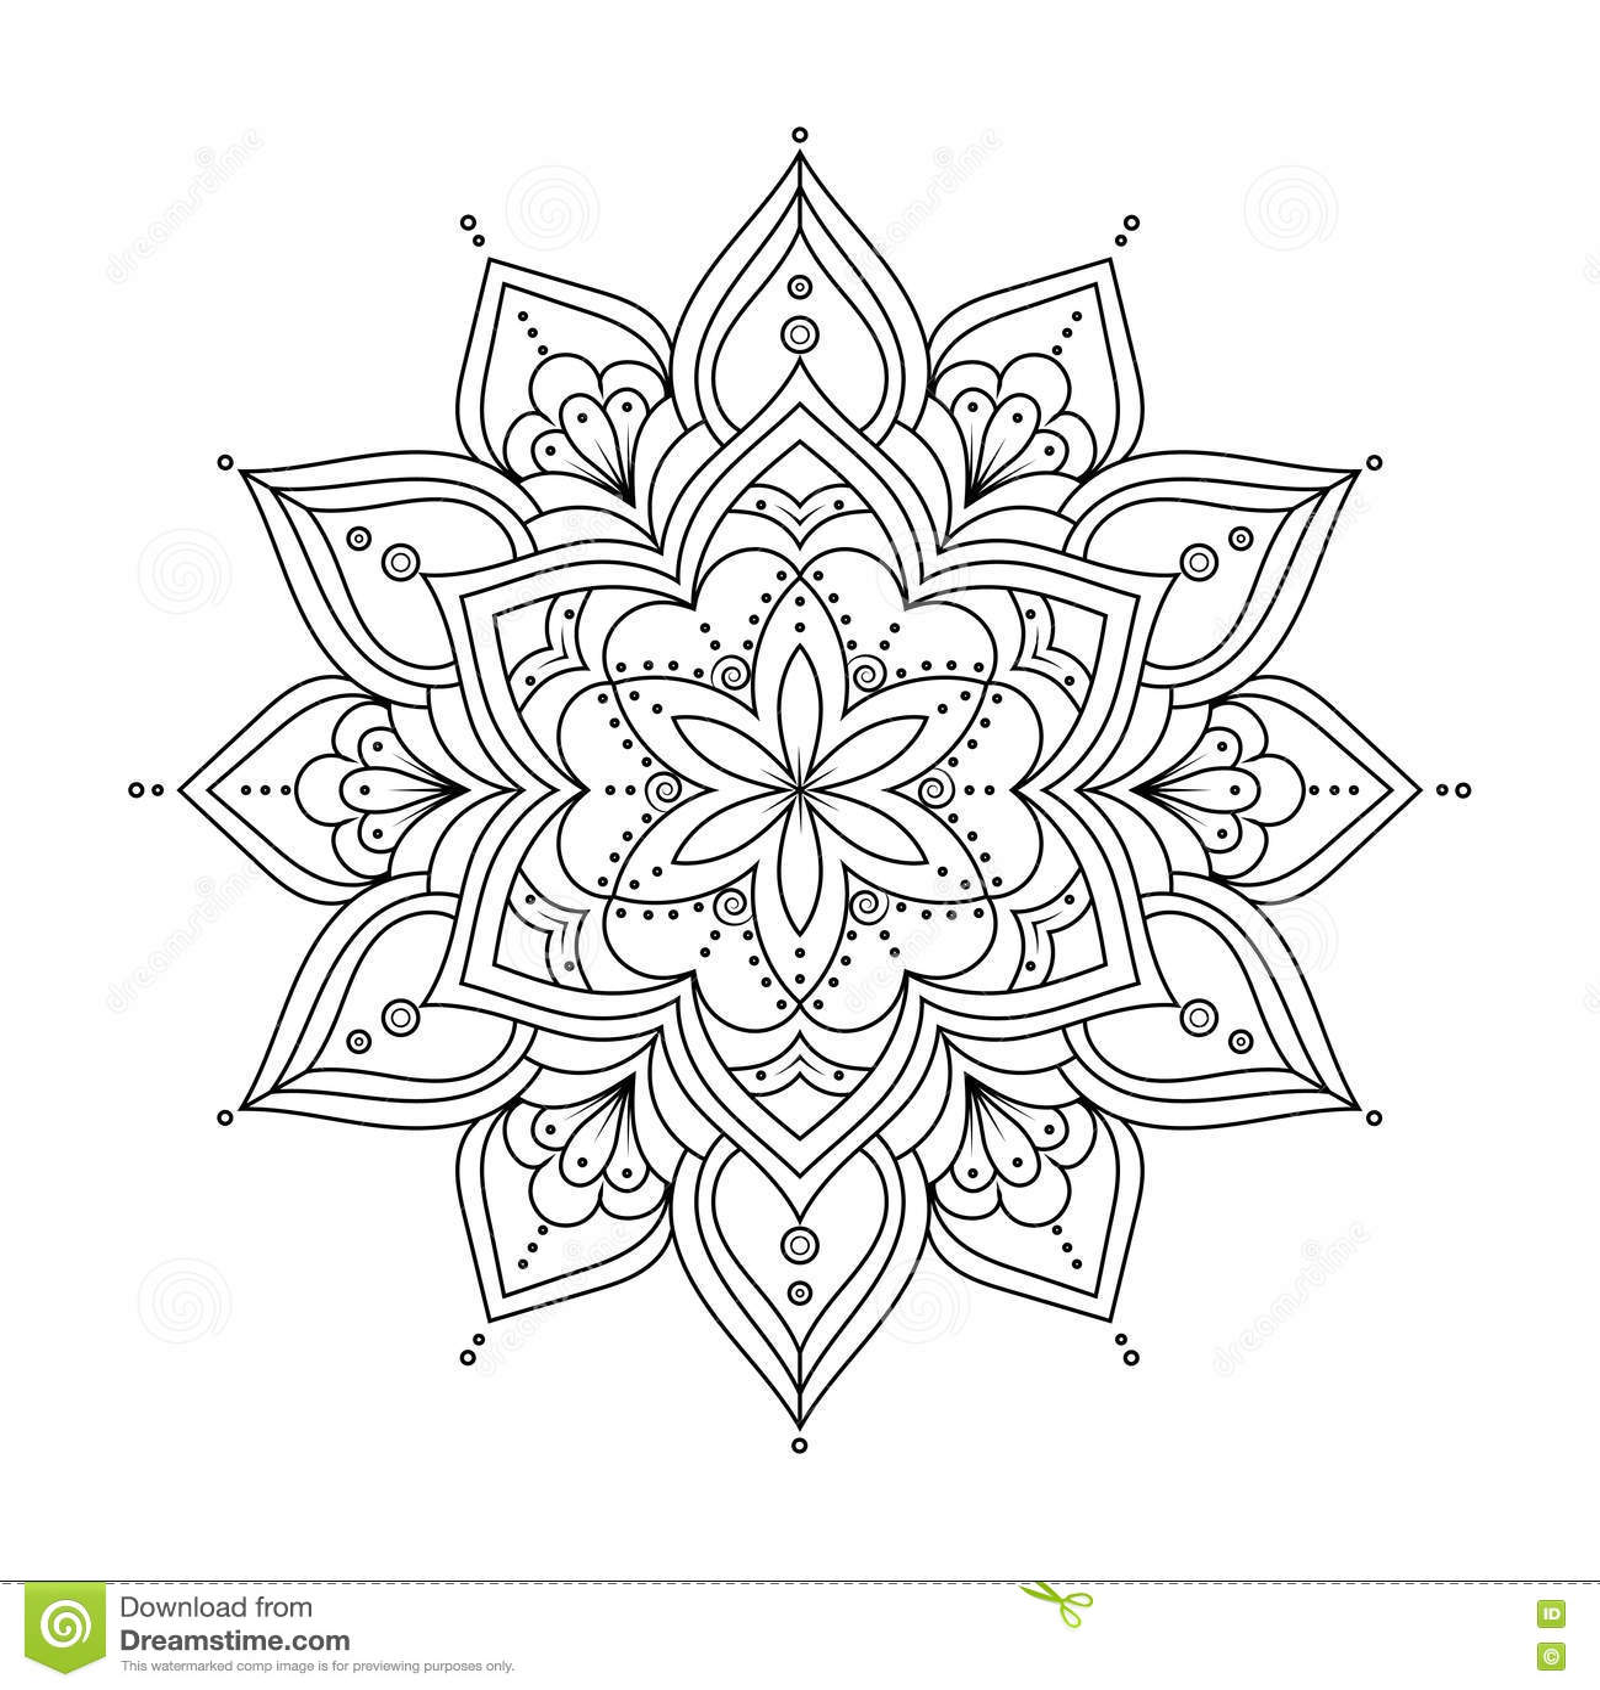 Hand Drawn Ethnic Background Royalty-Free Stock Photo